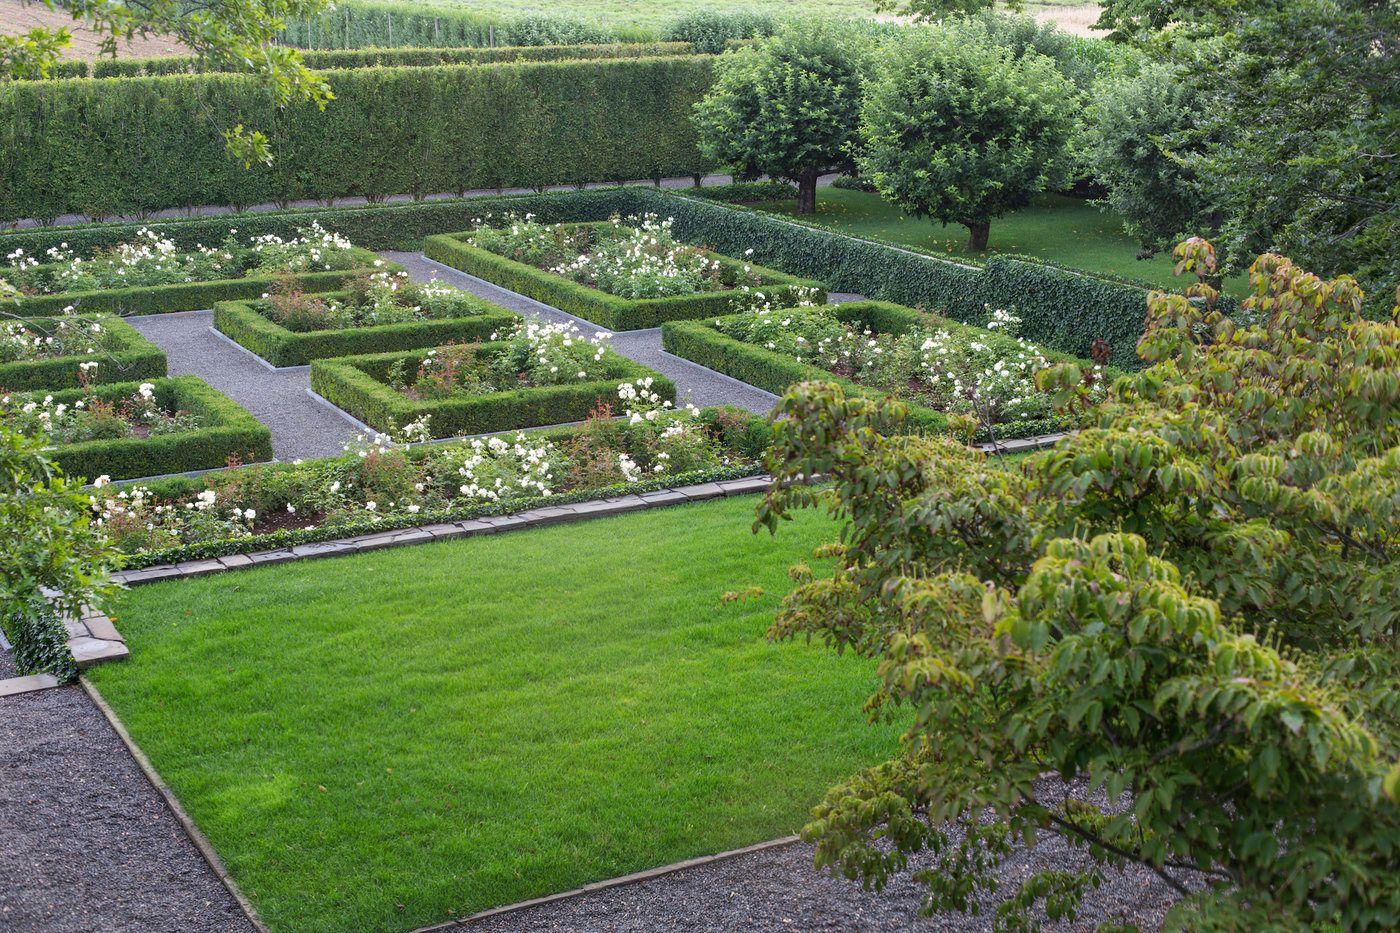 Landscaping 10 Rose Garden Design Ideas Gardenista Rose Garden Design Garden Design Layout Garden Design